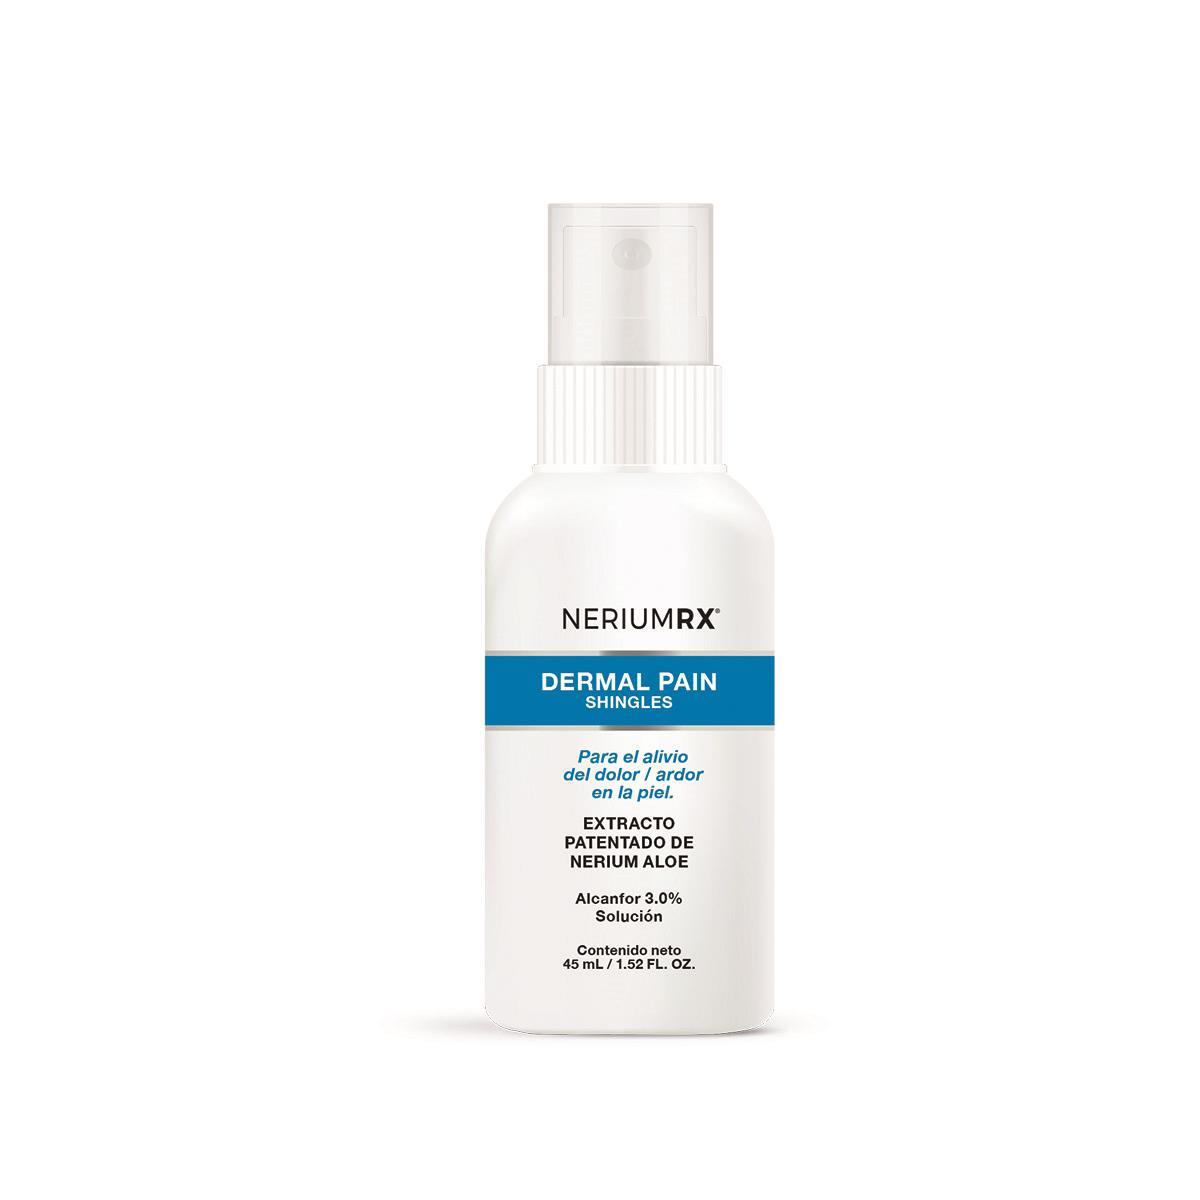 Neriumrx Dermal Pain 45Ml